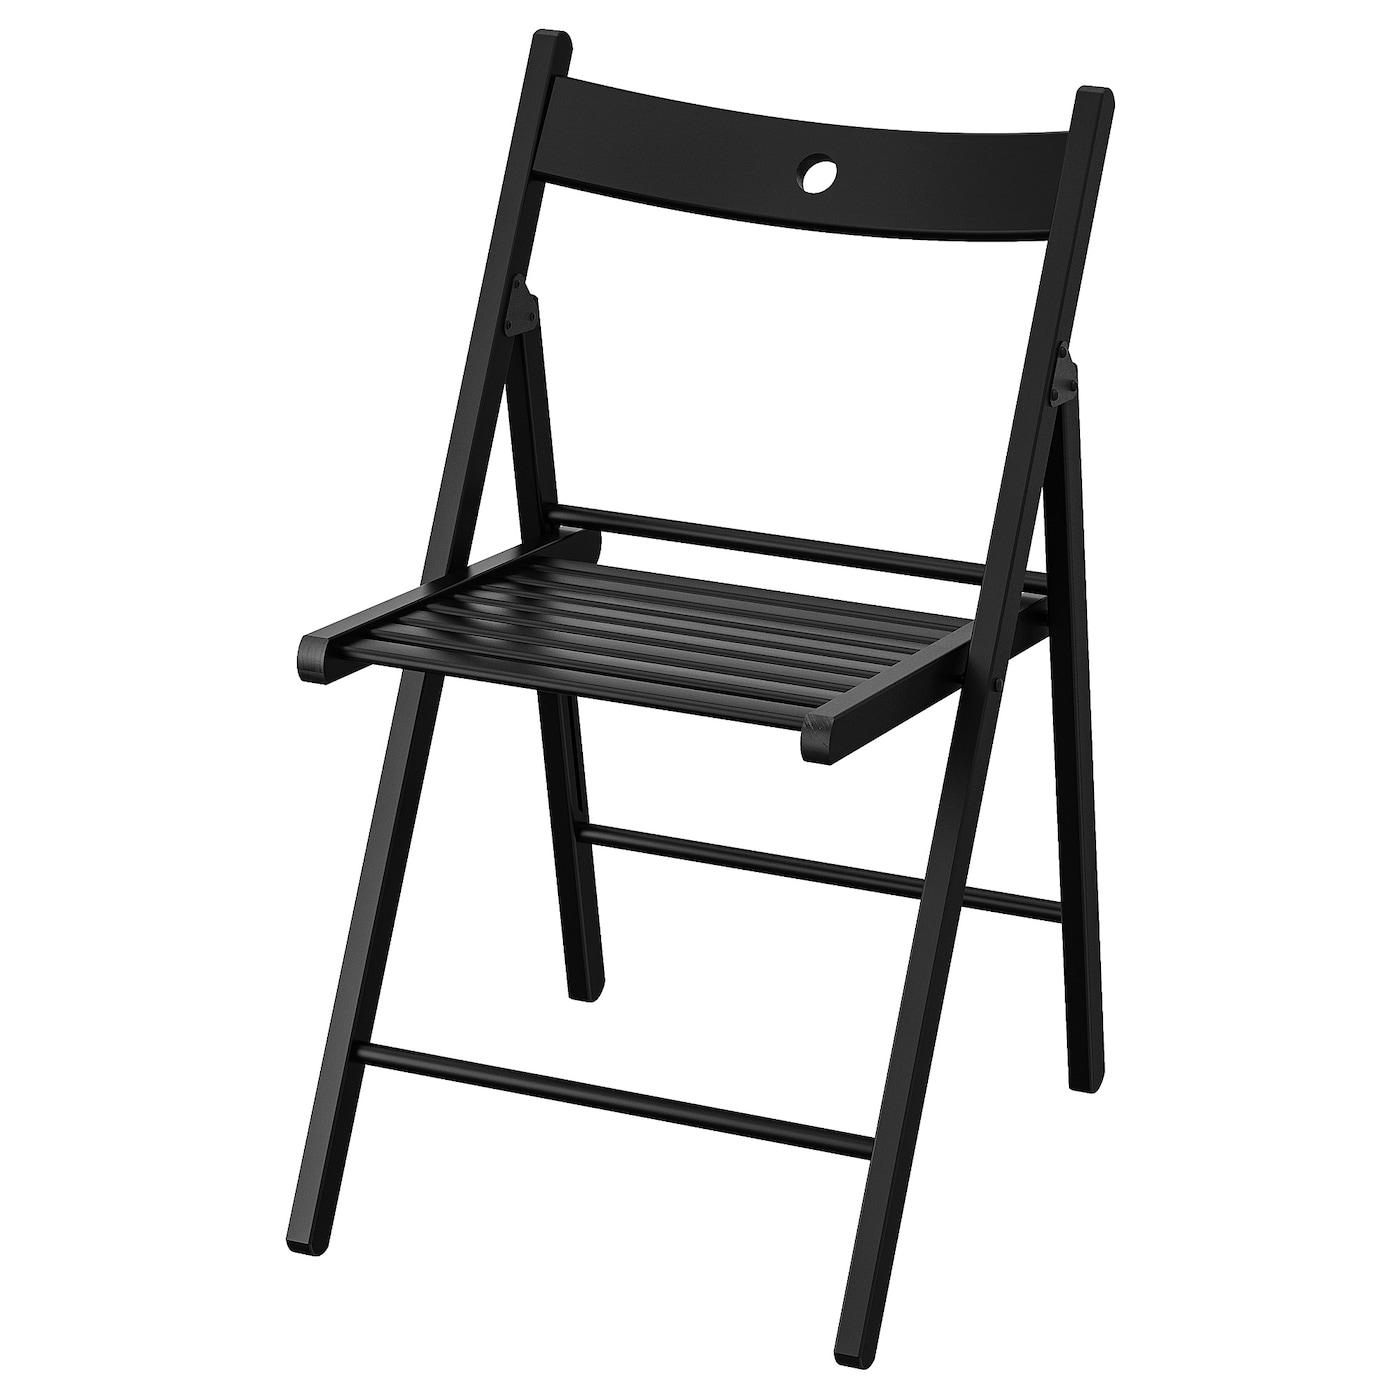 TERJE Folding chair black